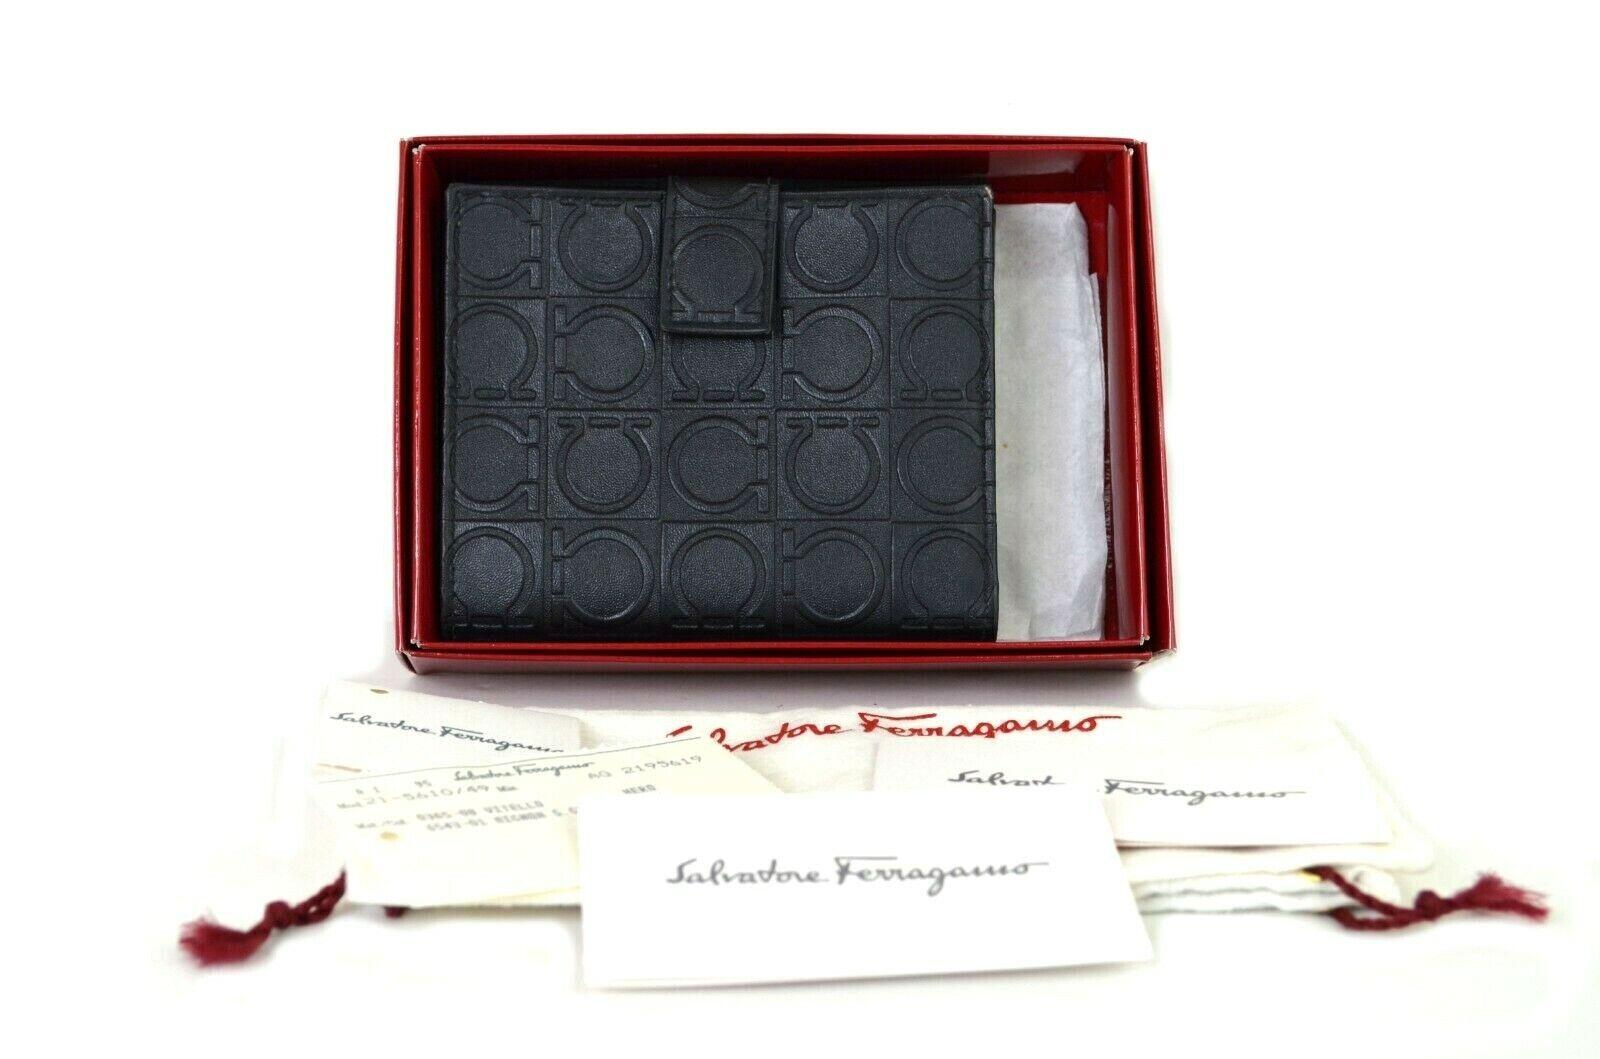 Auth Salvatore Ferragamo Black Leather Gancini Logo Wallet Purse Women Italy4666